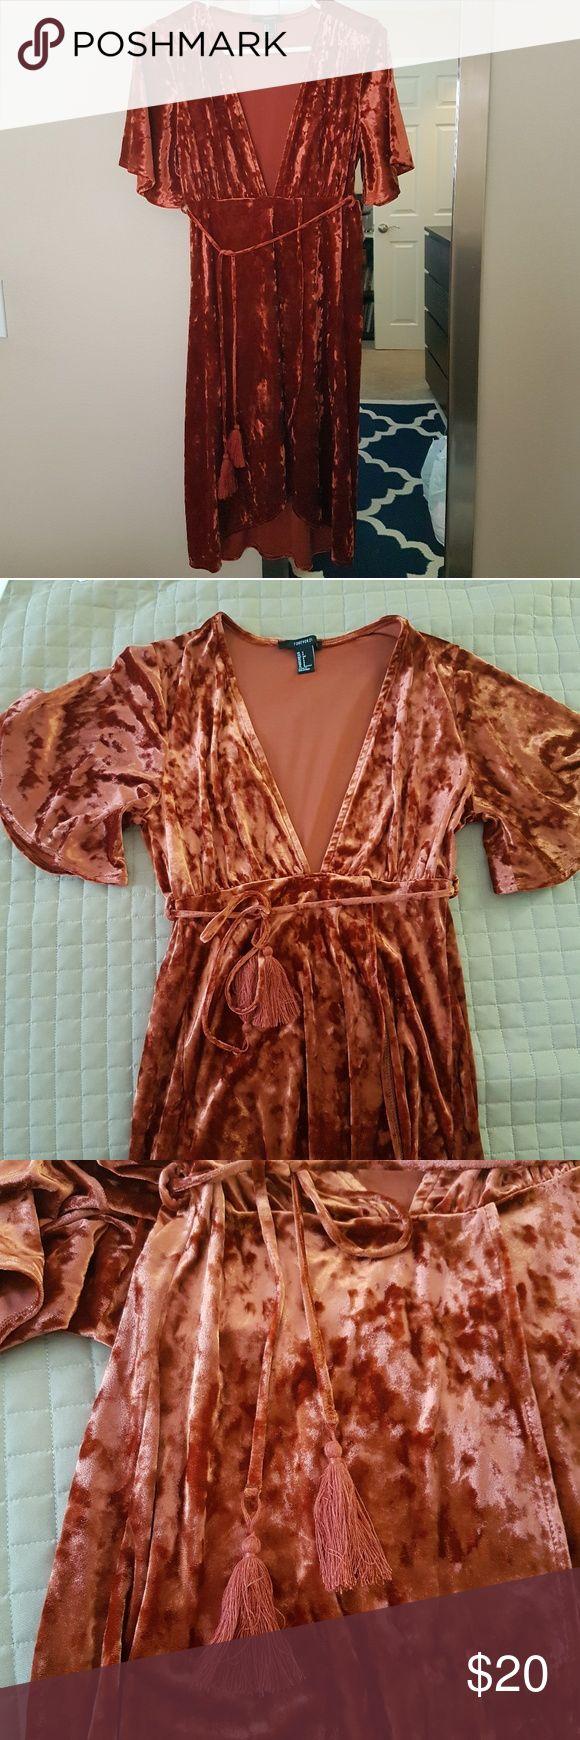 NWOT Crushed Velvet Plunging Midi Dress NWOT.  Crushed Velvet Plunging Midi Dress.  Color is an almost burnt orange-red. Tulip style bottom skirt part of the dress, has a tassel waist tie.  90% Polyester, 10% Spandex. Forever 21 Dresses High Low